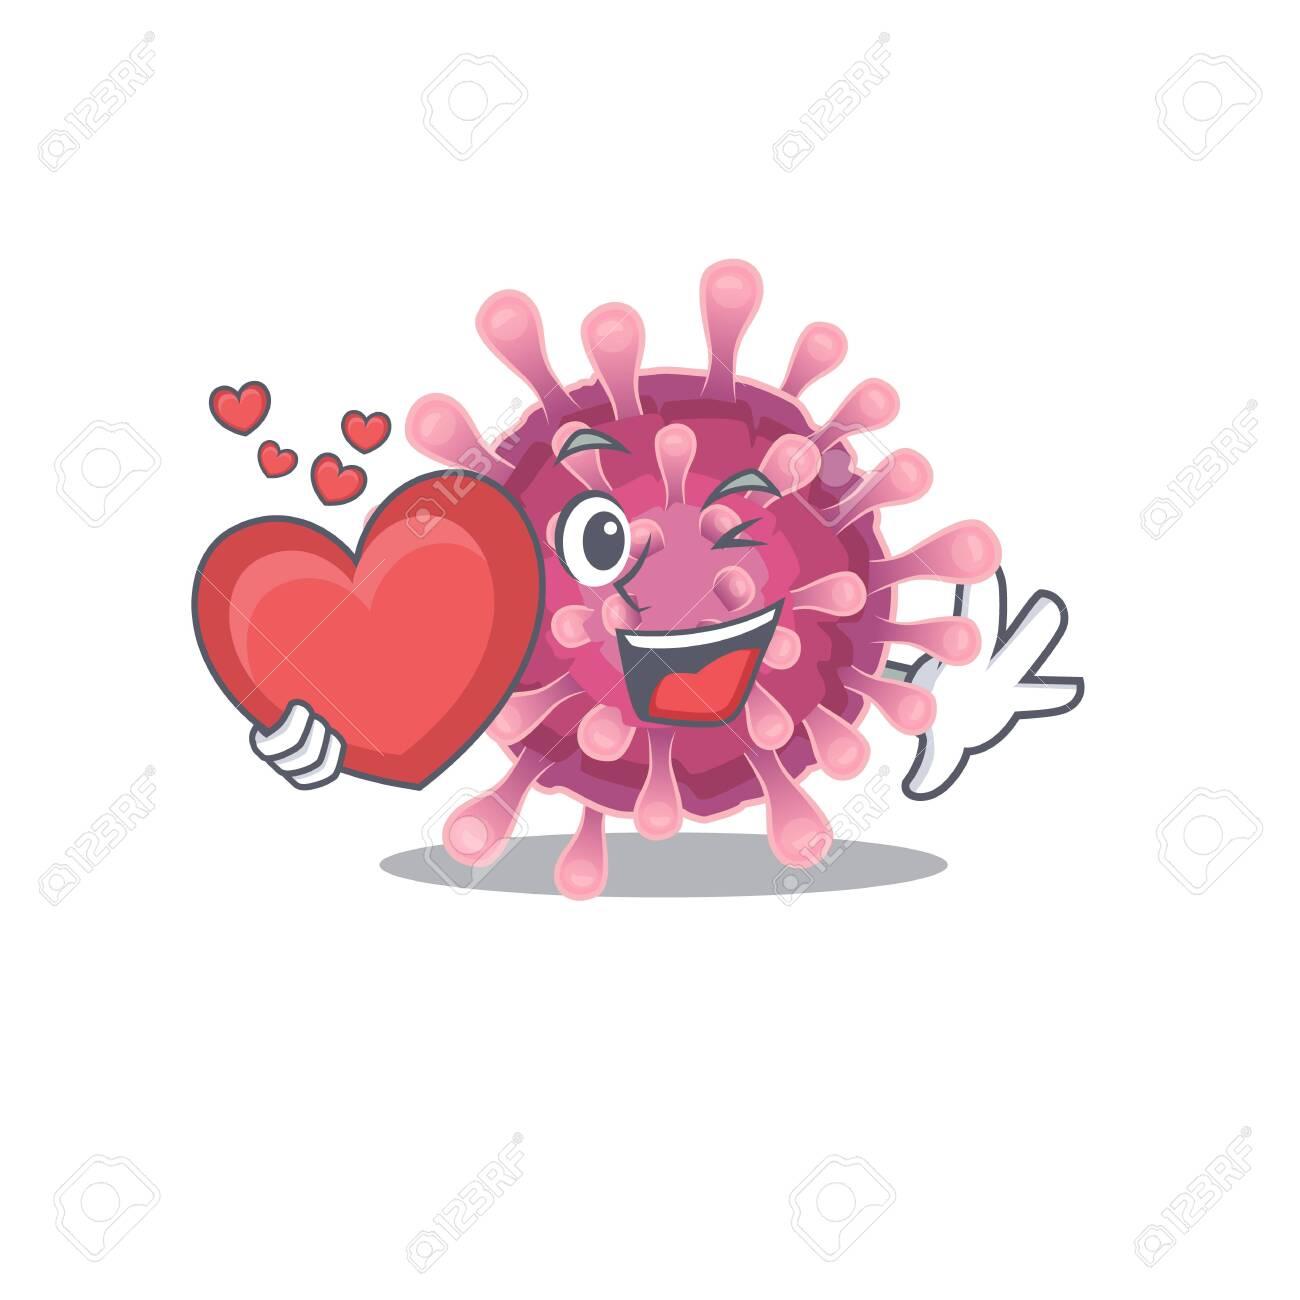 138884934-funny-face-corona-virus-cartoo